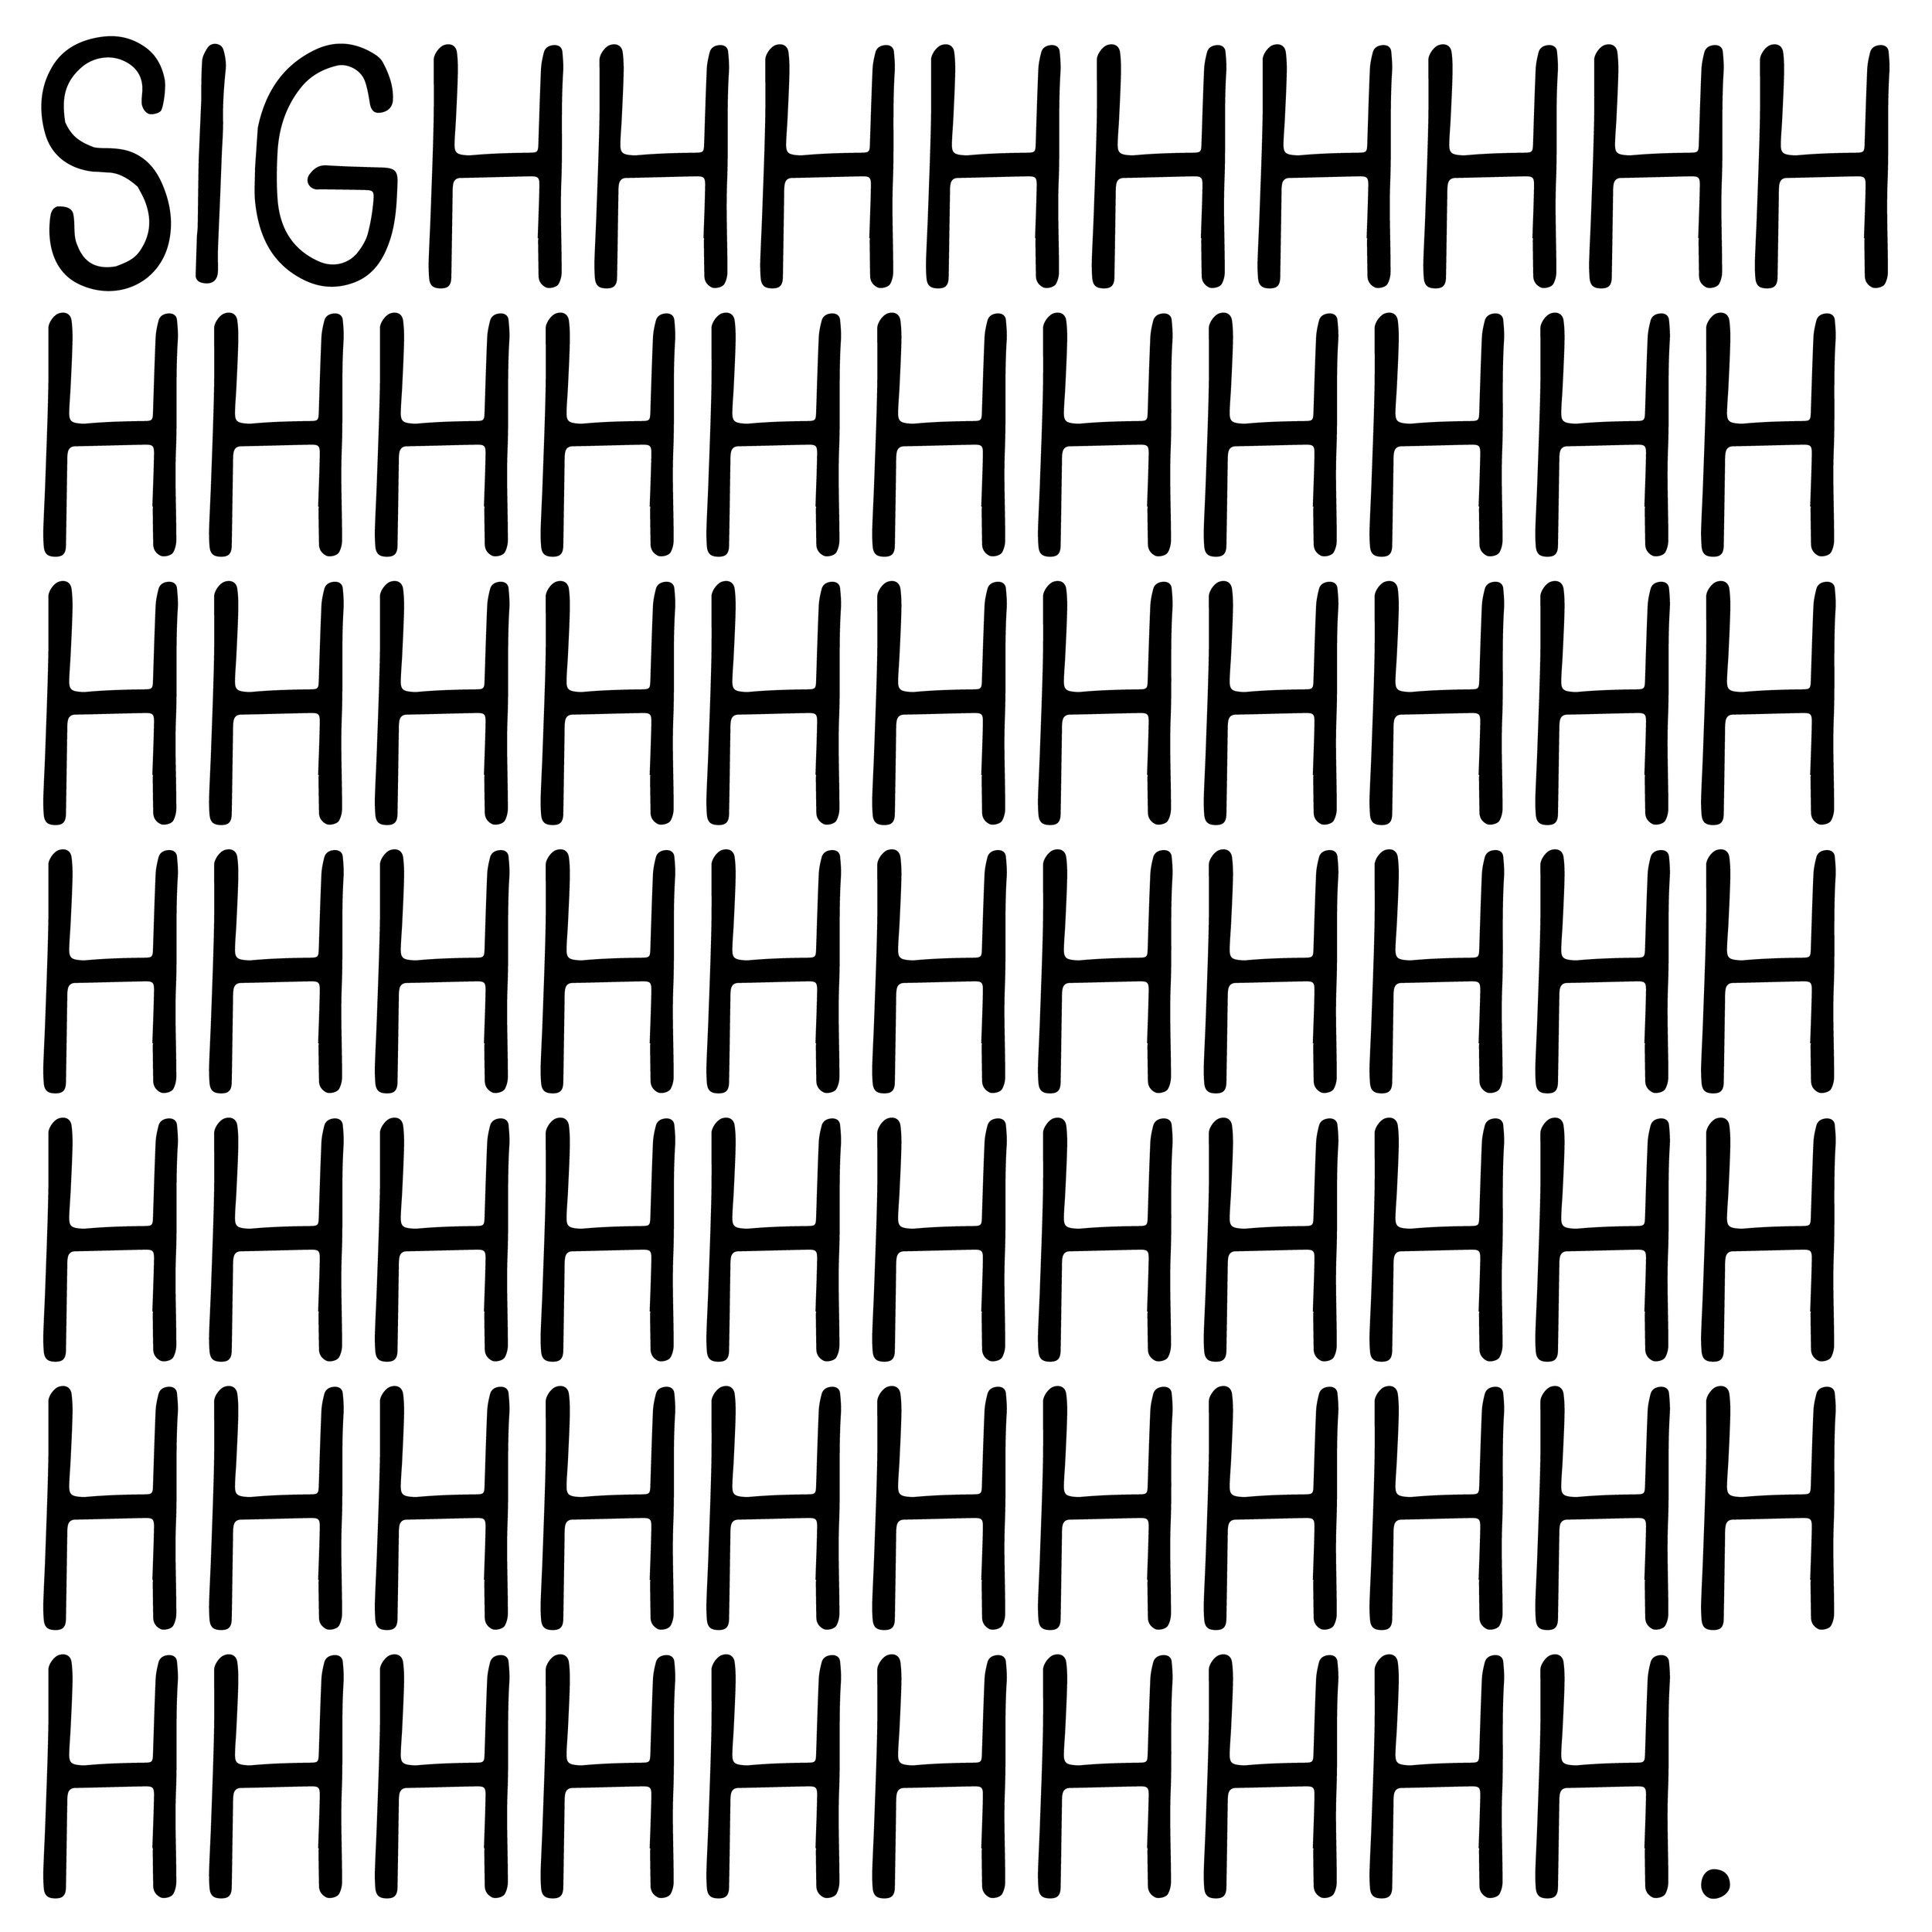 sigh-01.jpg